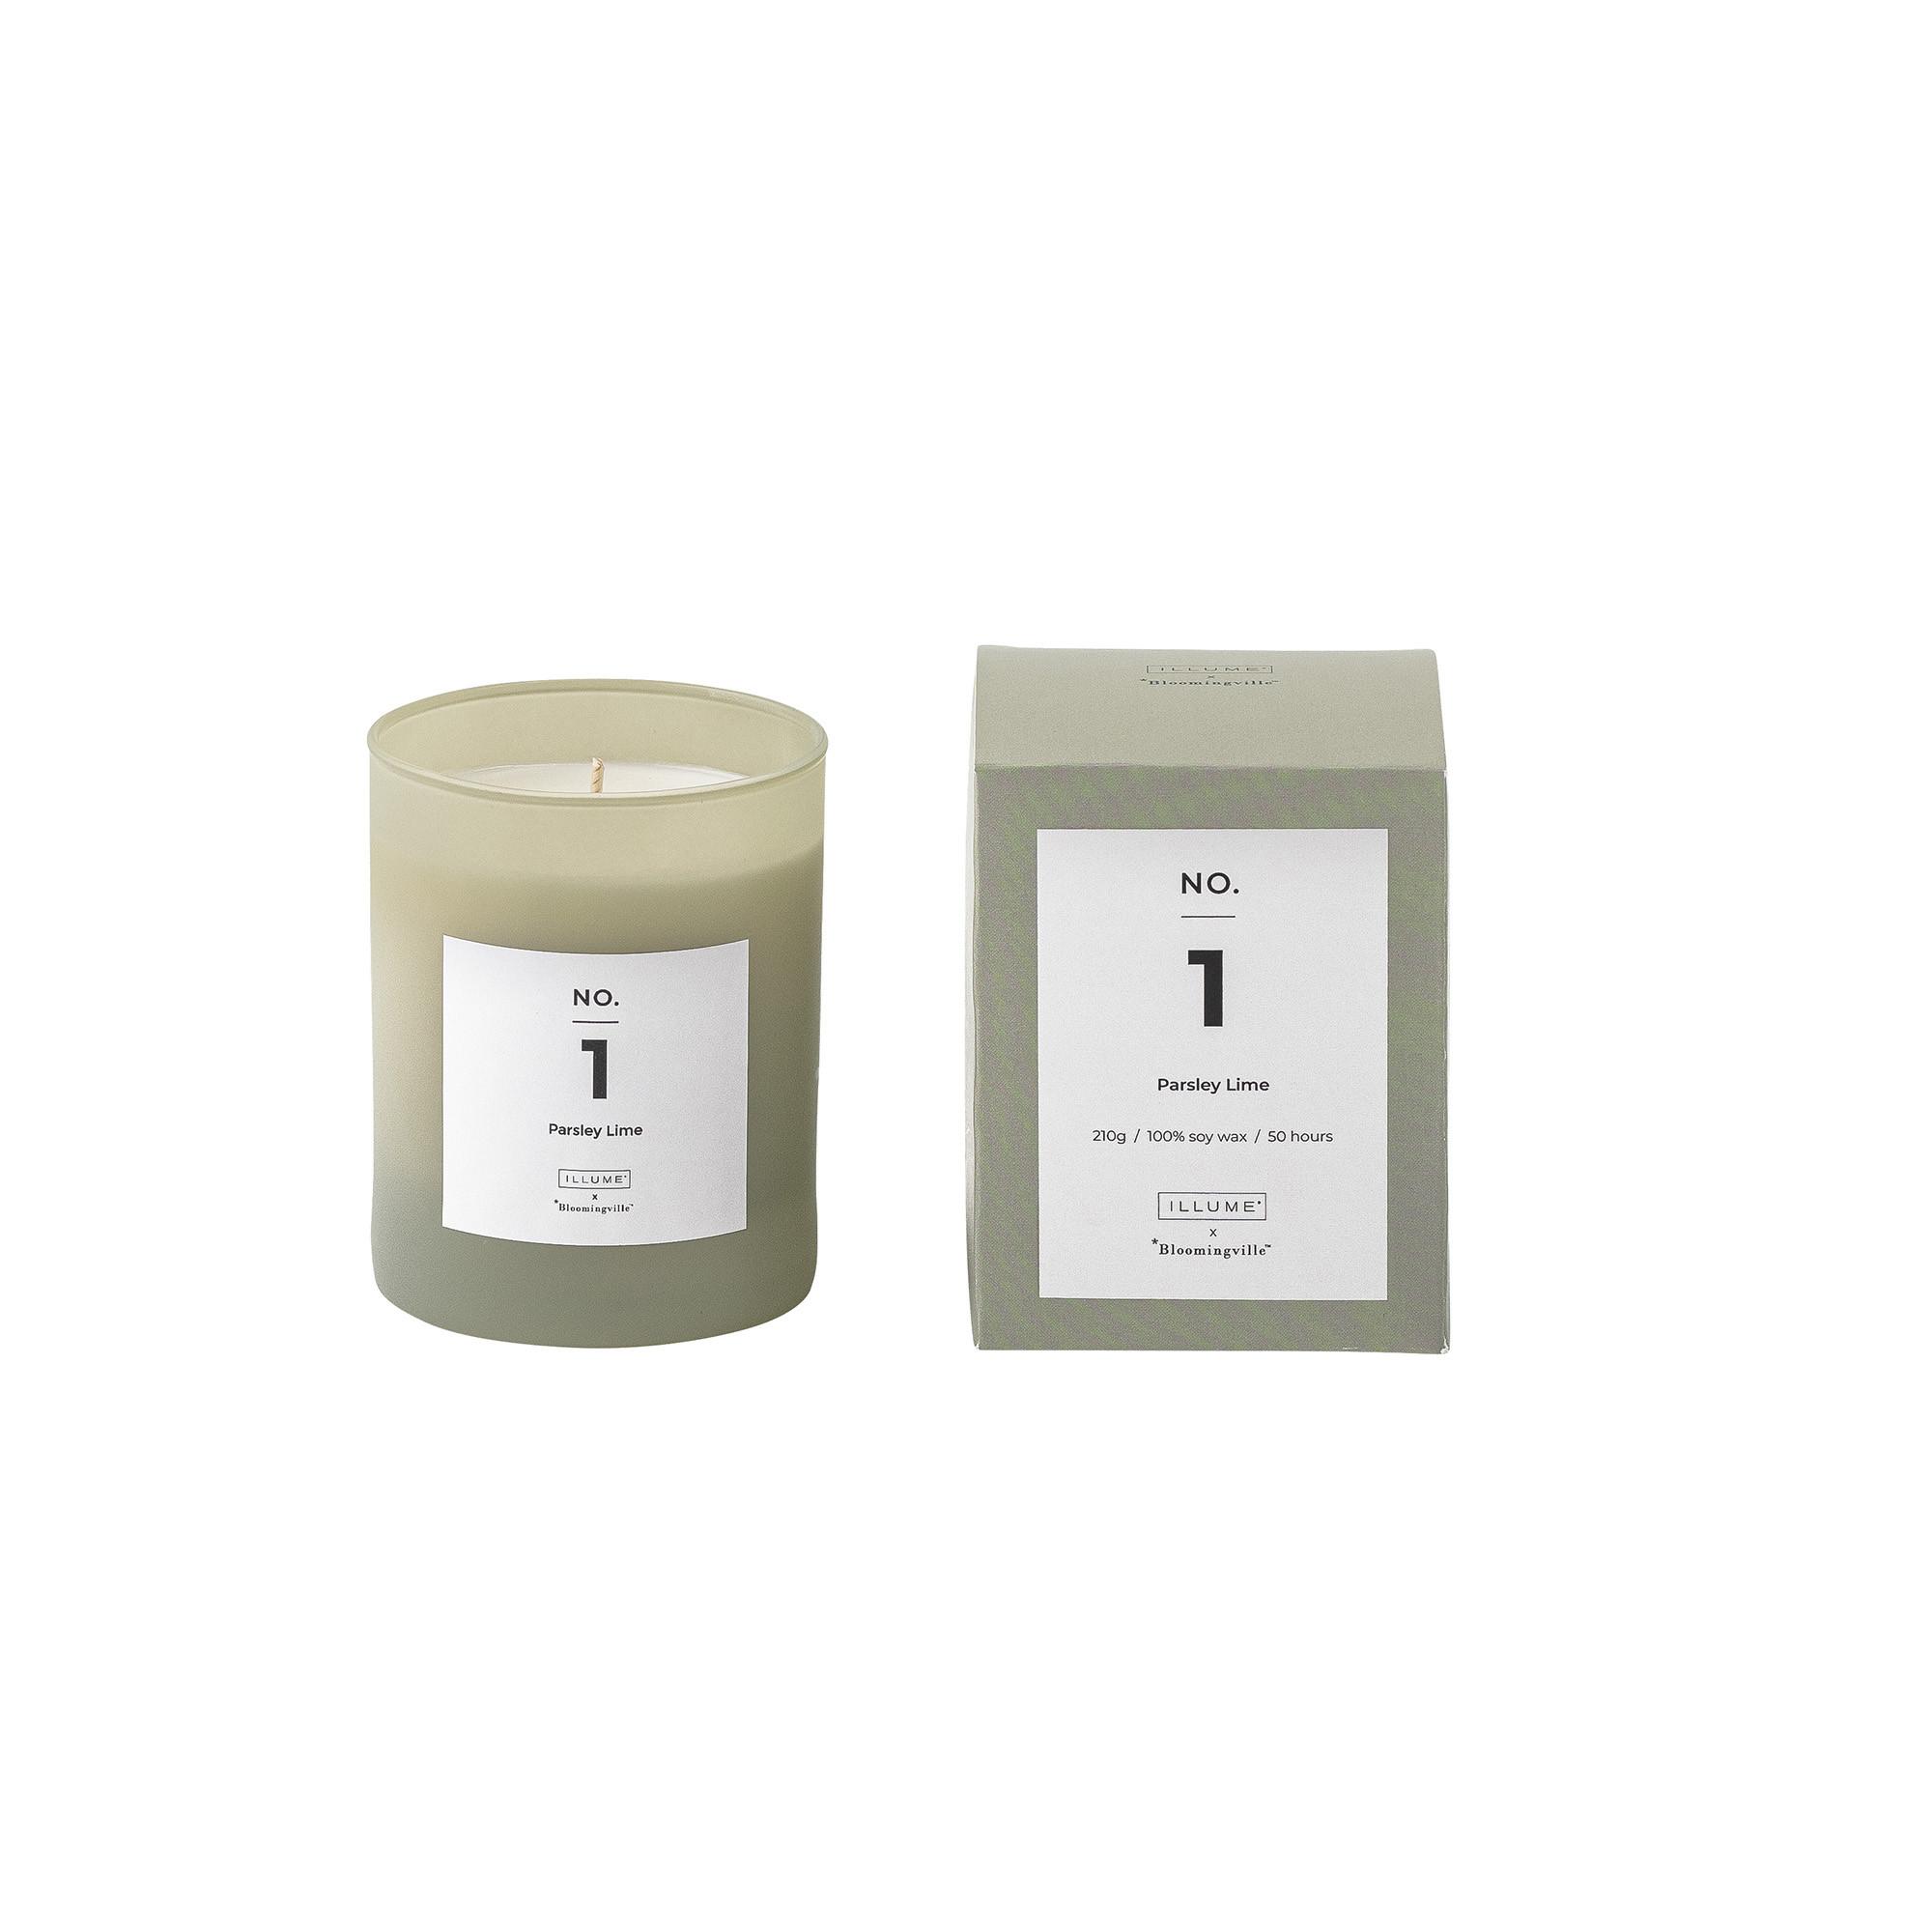 NO. 1 Duftlys – Parsley & Lime